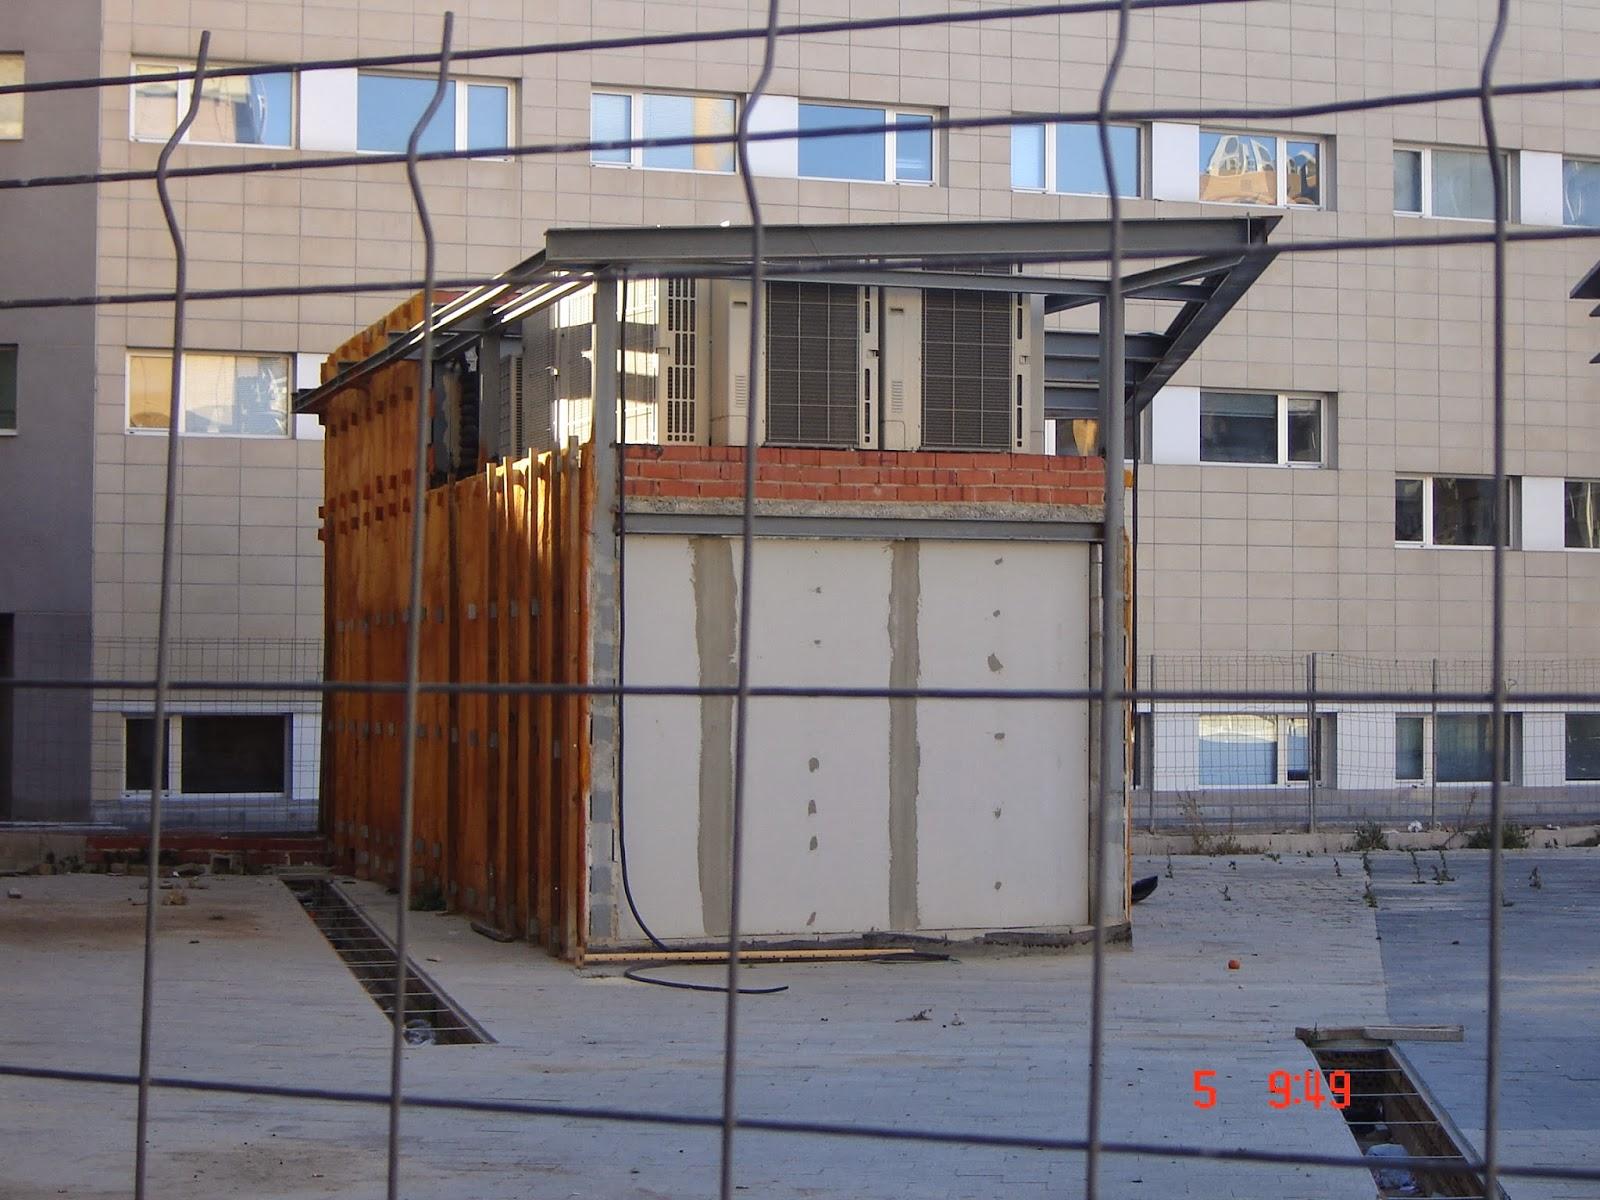 Archivo hist rico municipal de molina de segura muralla for Piscina municipal molina de segura